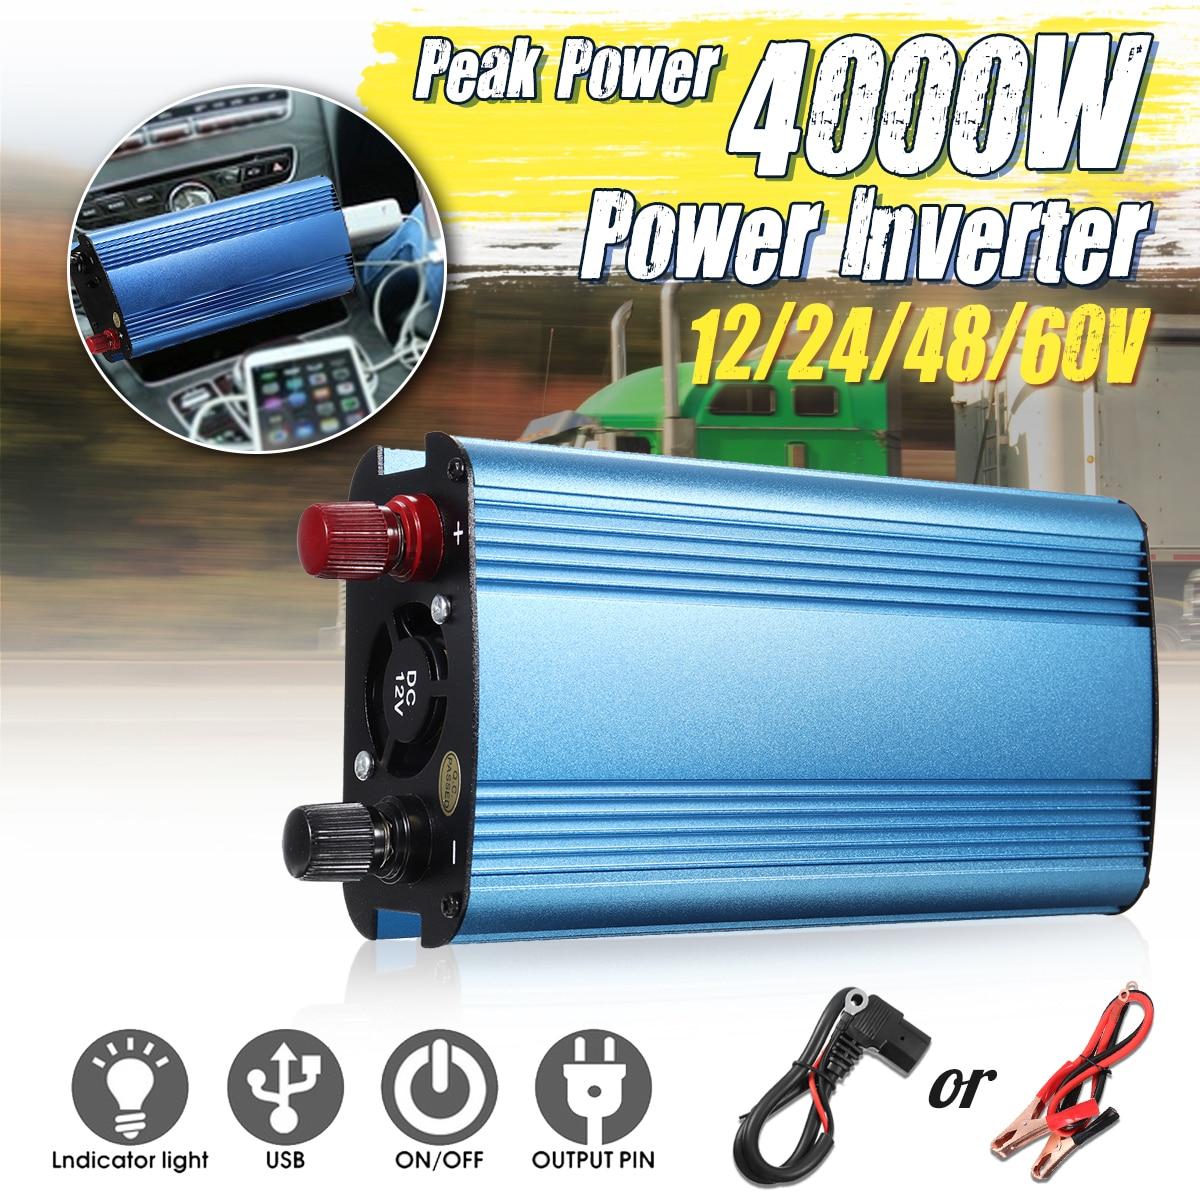 Autoleader 4000W Peak Power Car Power Inverter Charger Sine Wave DC 12V/24V/48V/60V To AC 220V Inverter Voltage Converter 4000w peak w 4 usb car power inverter 2000w dc 12v to ac 220v charger converter car led power inverter 4000w dc 12v to ac220v